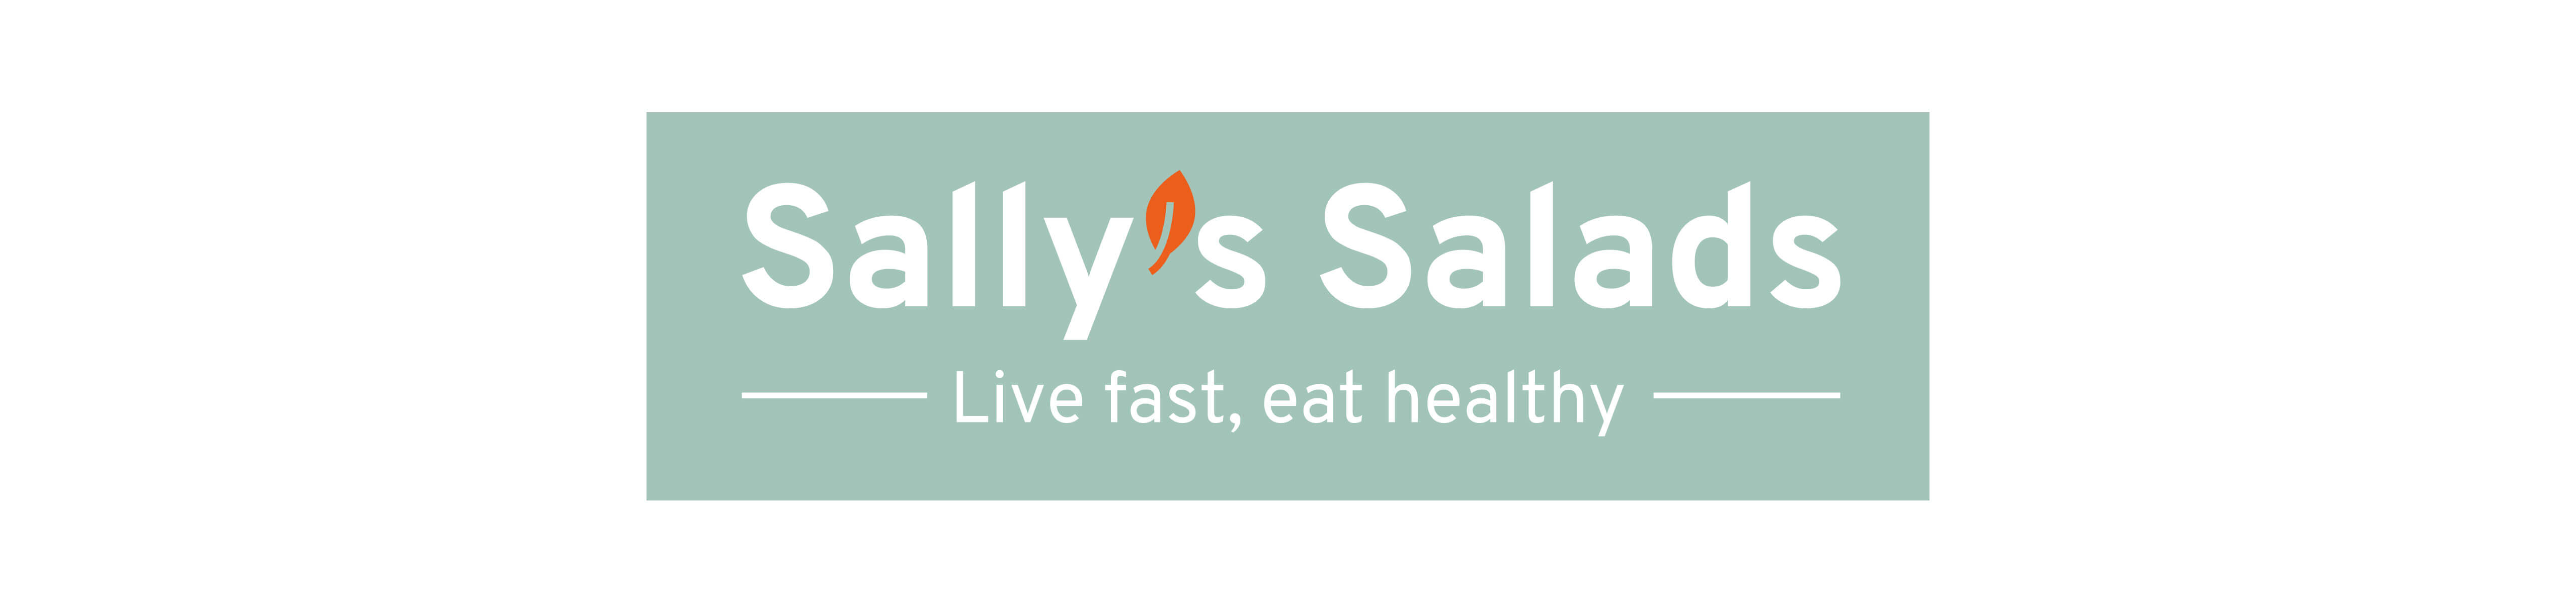 Sally's Salads, logo, Mixus studio